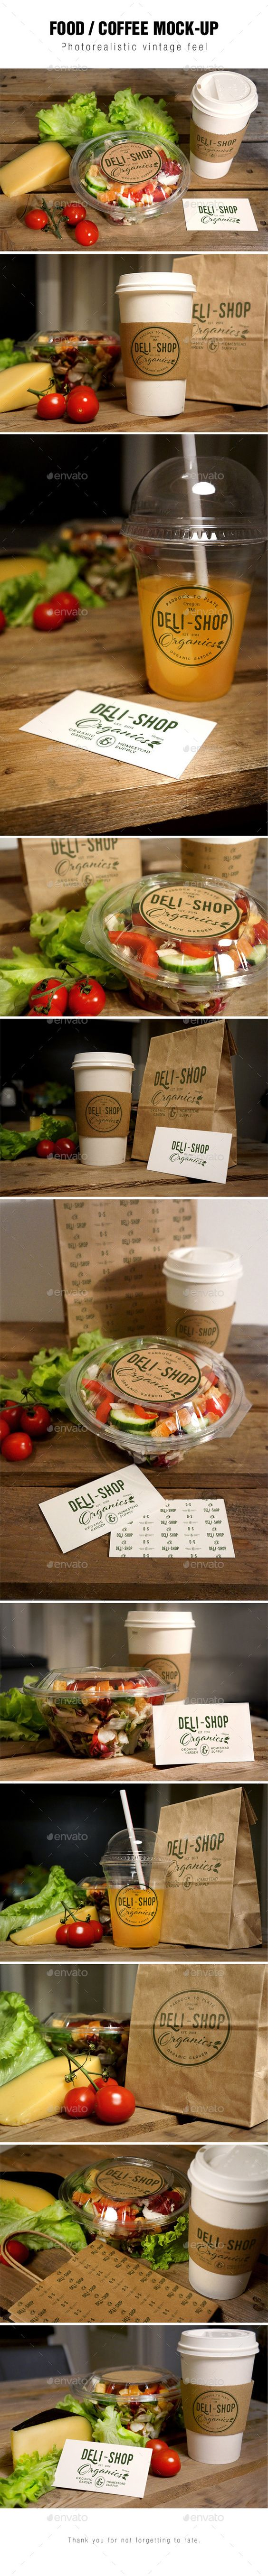 Food / Coffee Mockup | Download: http://graphicriver.net/item/food-coffee-mockup/11043417?ref=ksioks